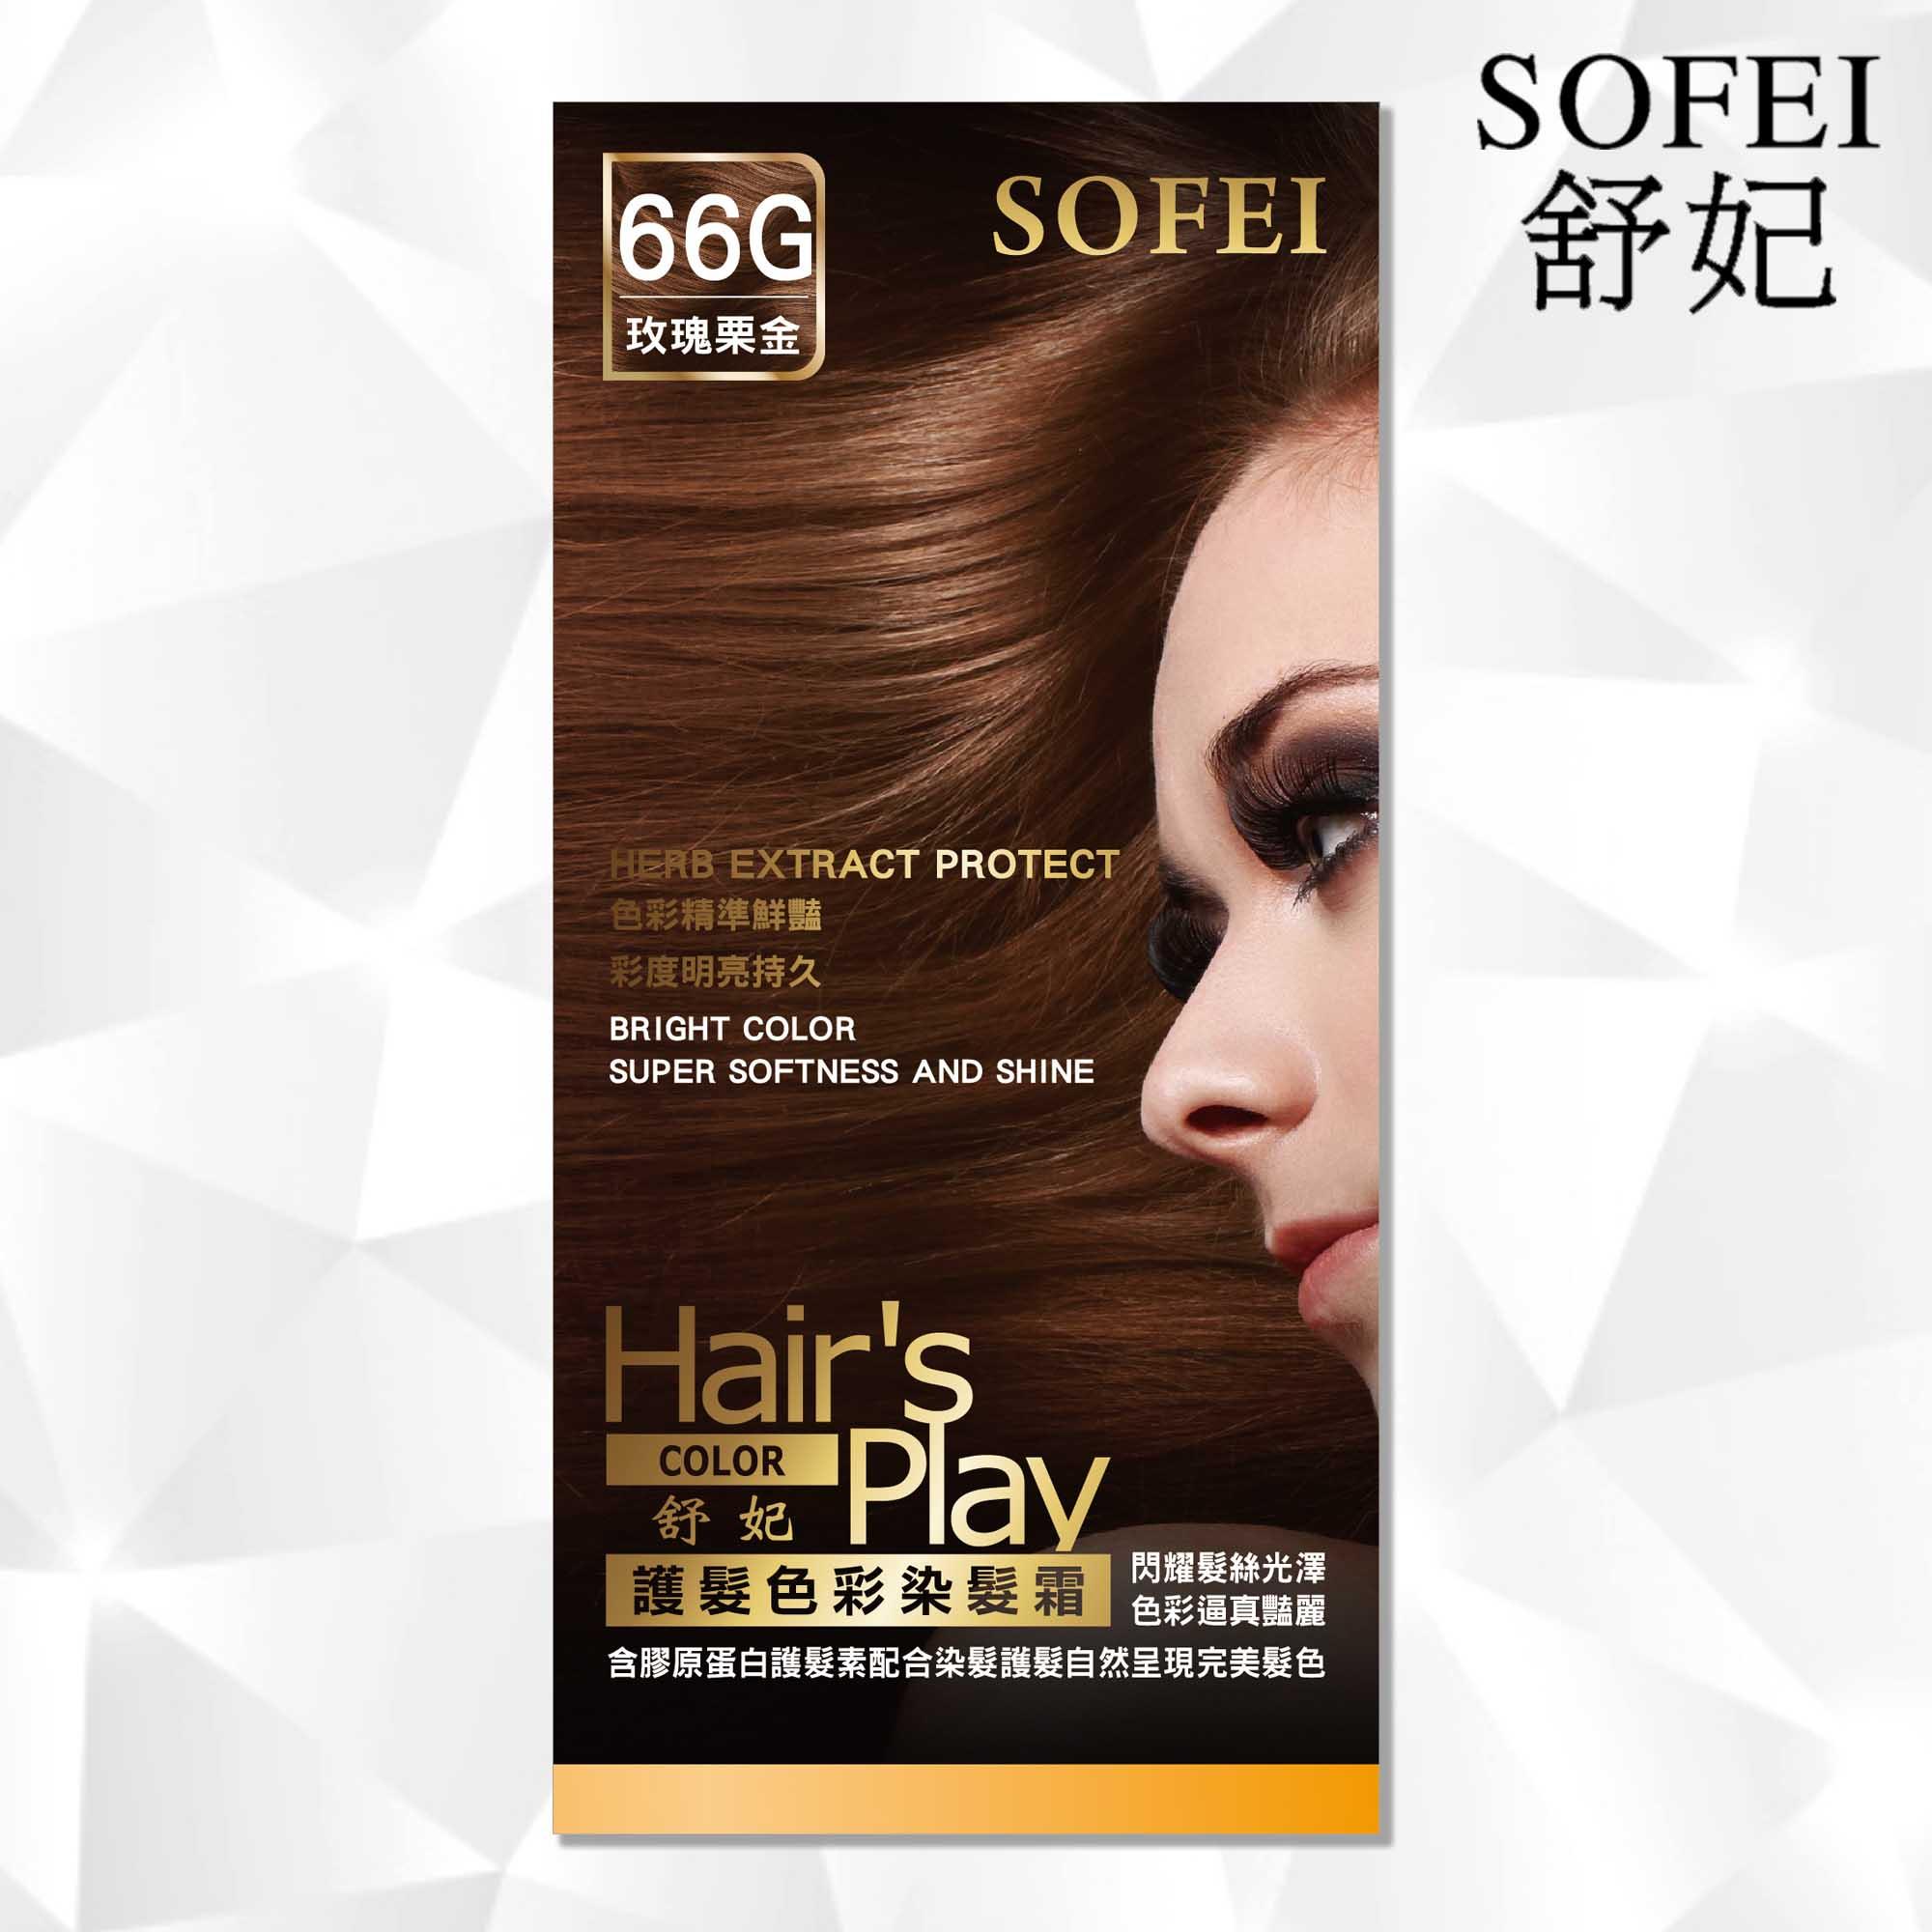 【SOFEI 舒妃】Hair's Play護髮色彩染髮霜-66G玫瑰栗金